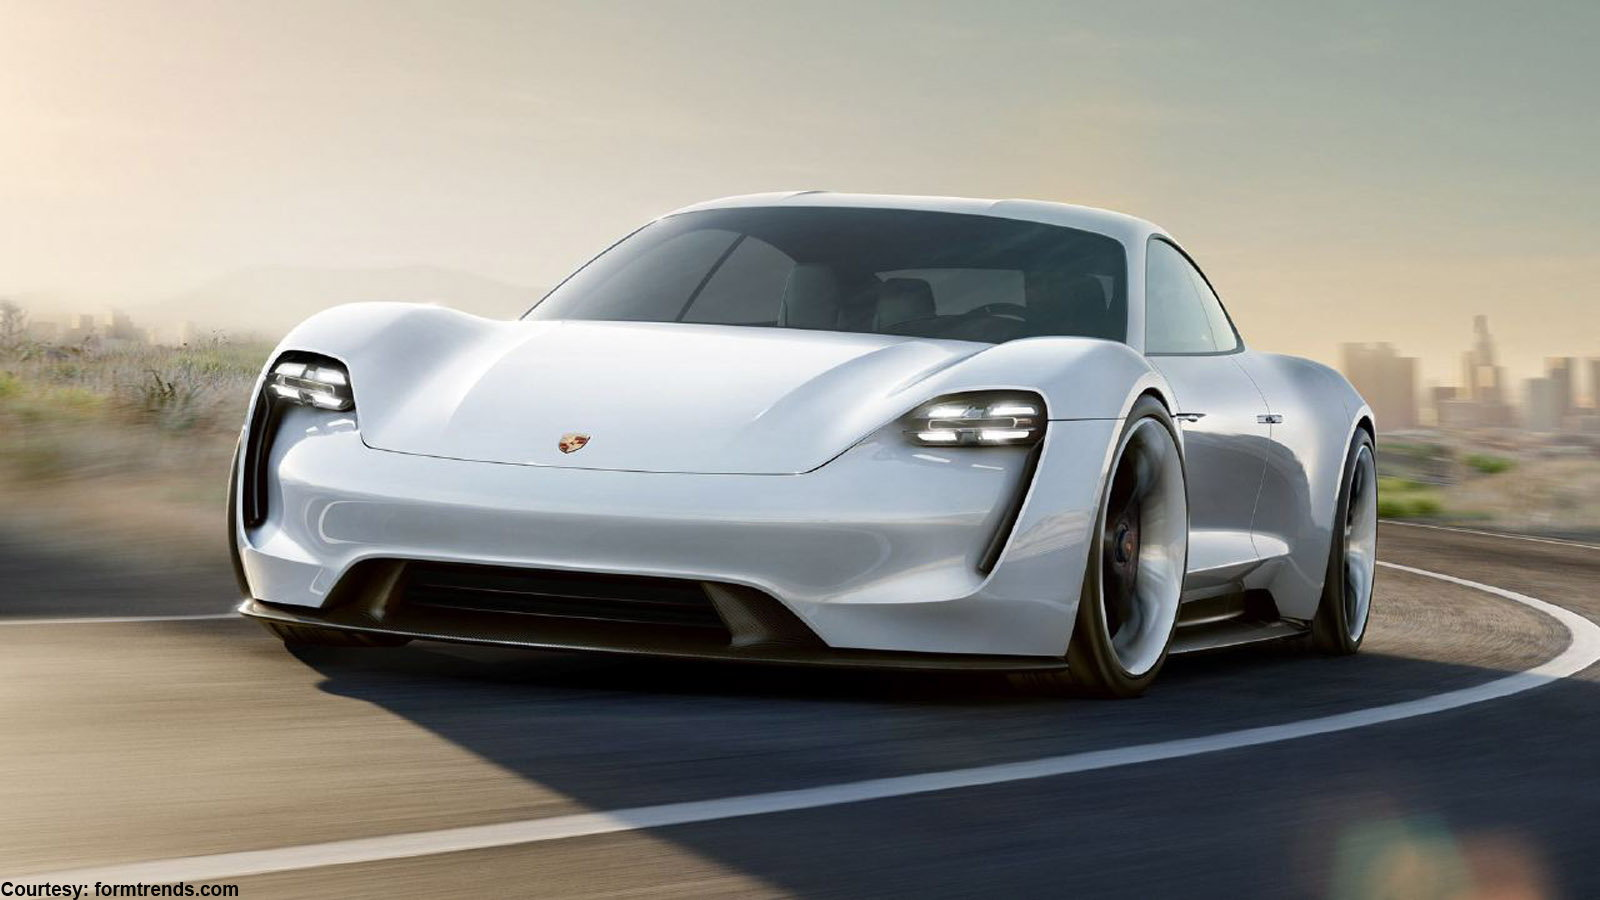 The Future is Porsche